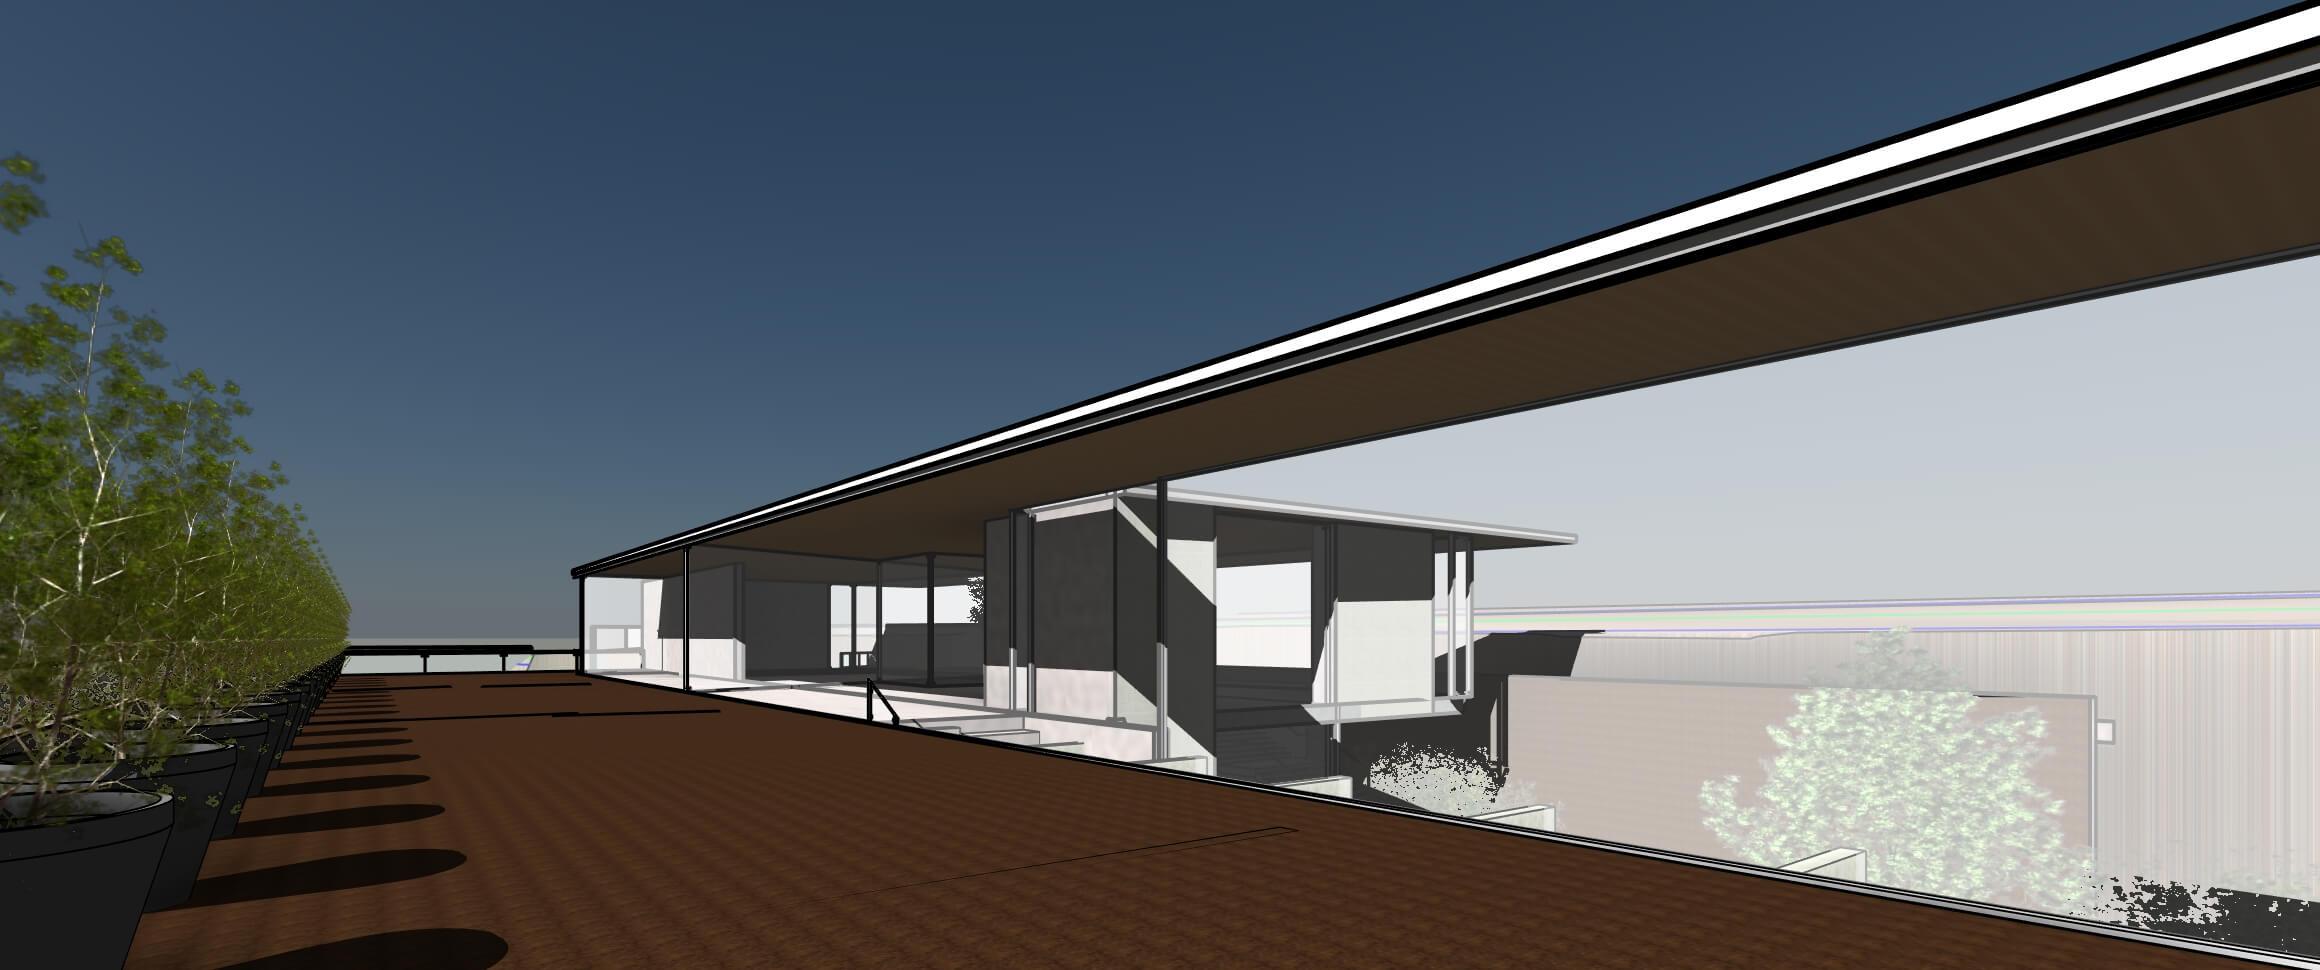 RZ-3D-new-3D-View-מרפסת-גג-מבט-לכוון-מערב